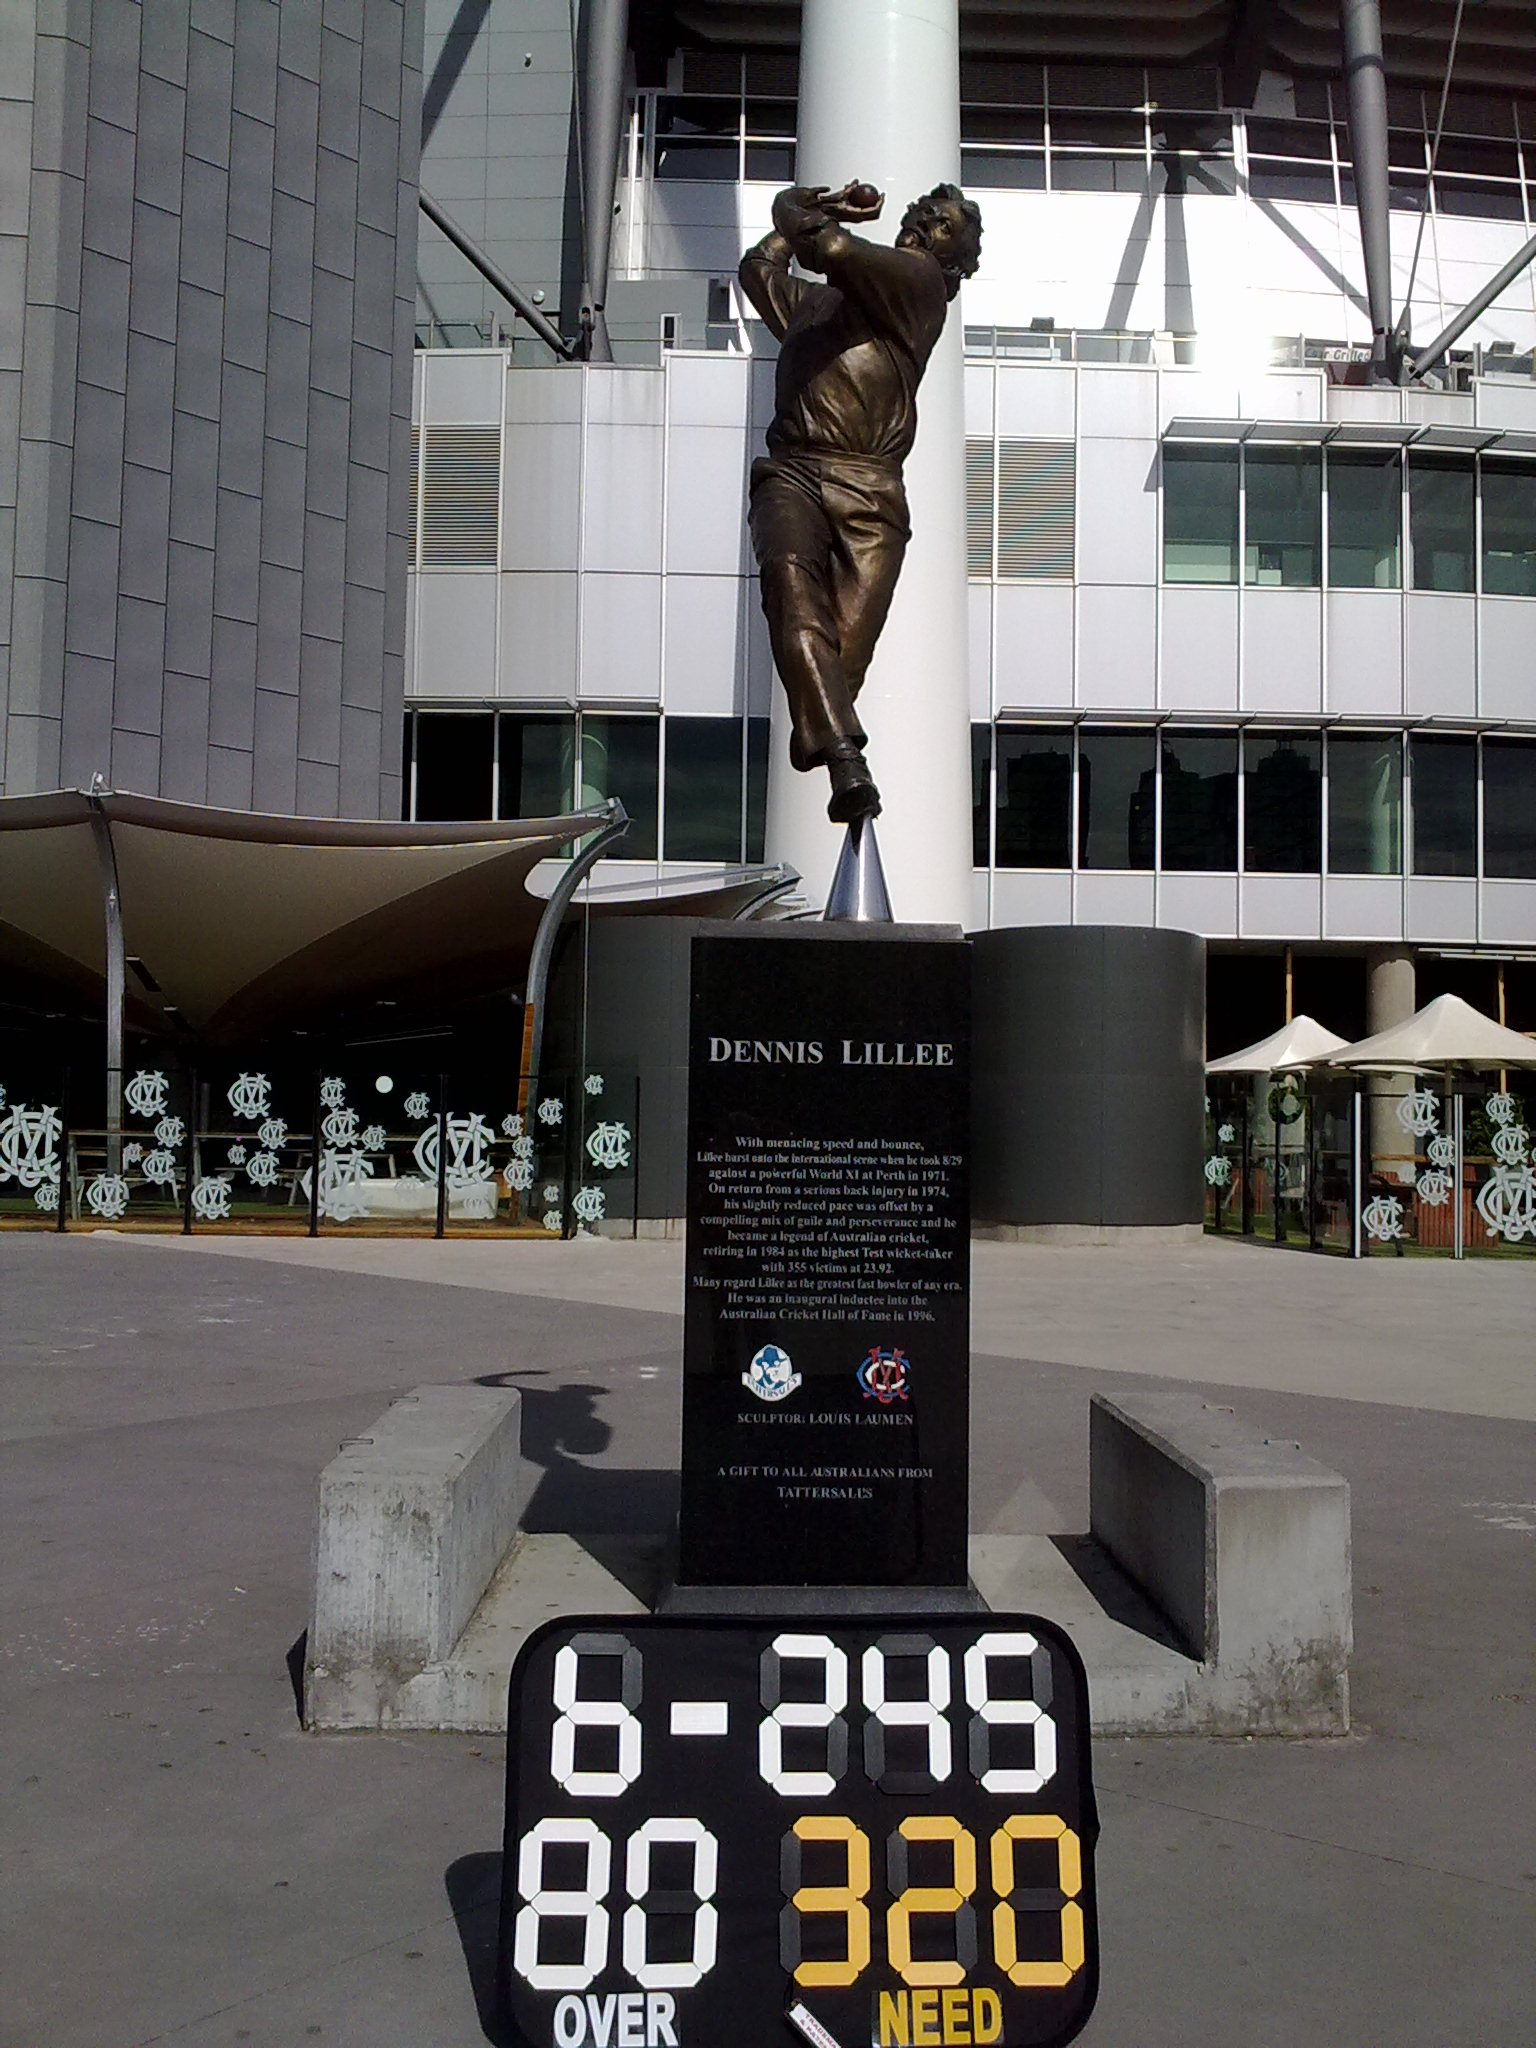 Dennis Lillee Cricket Scoreboard